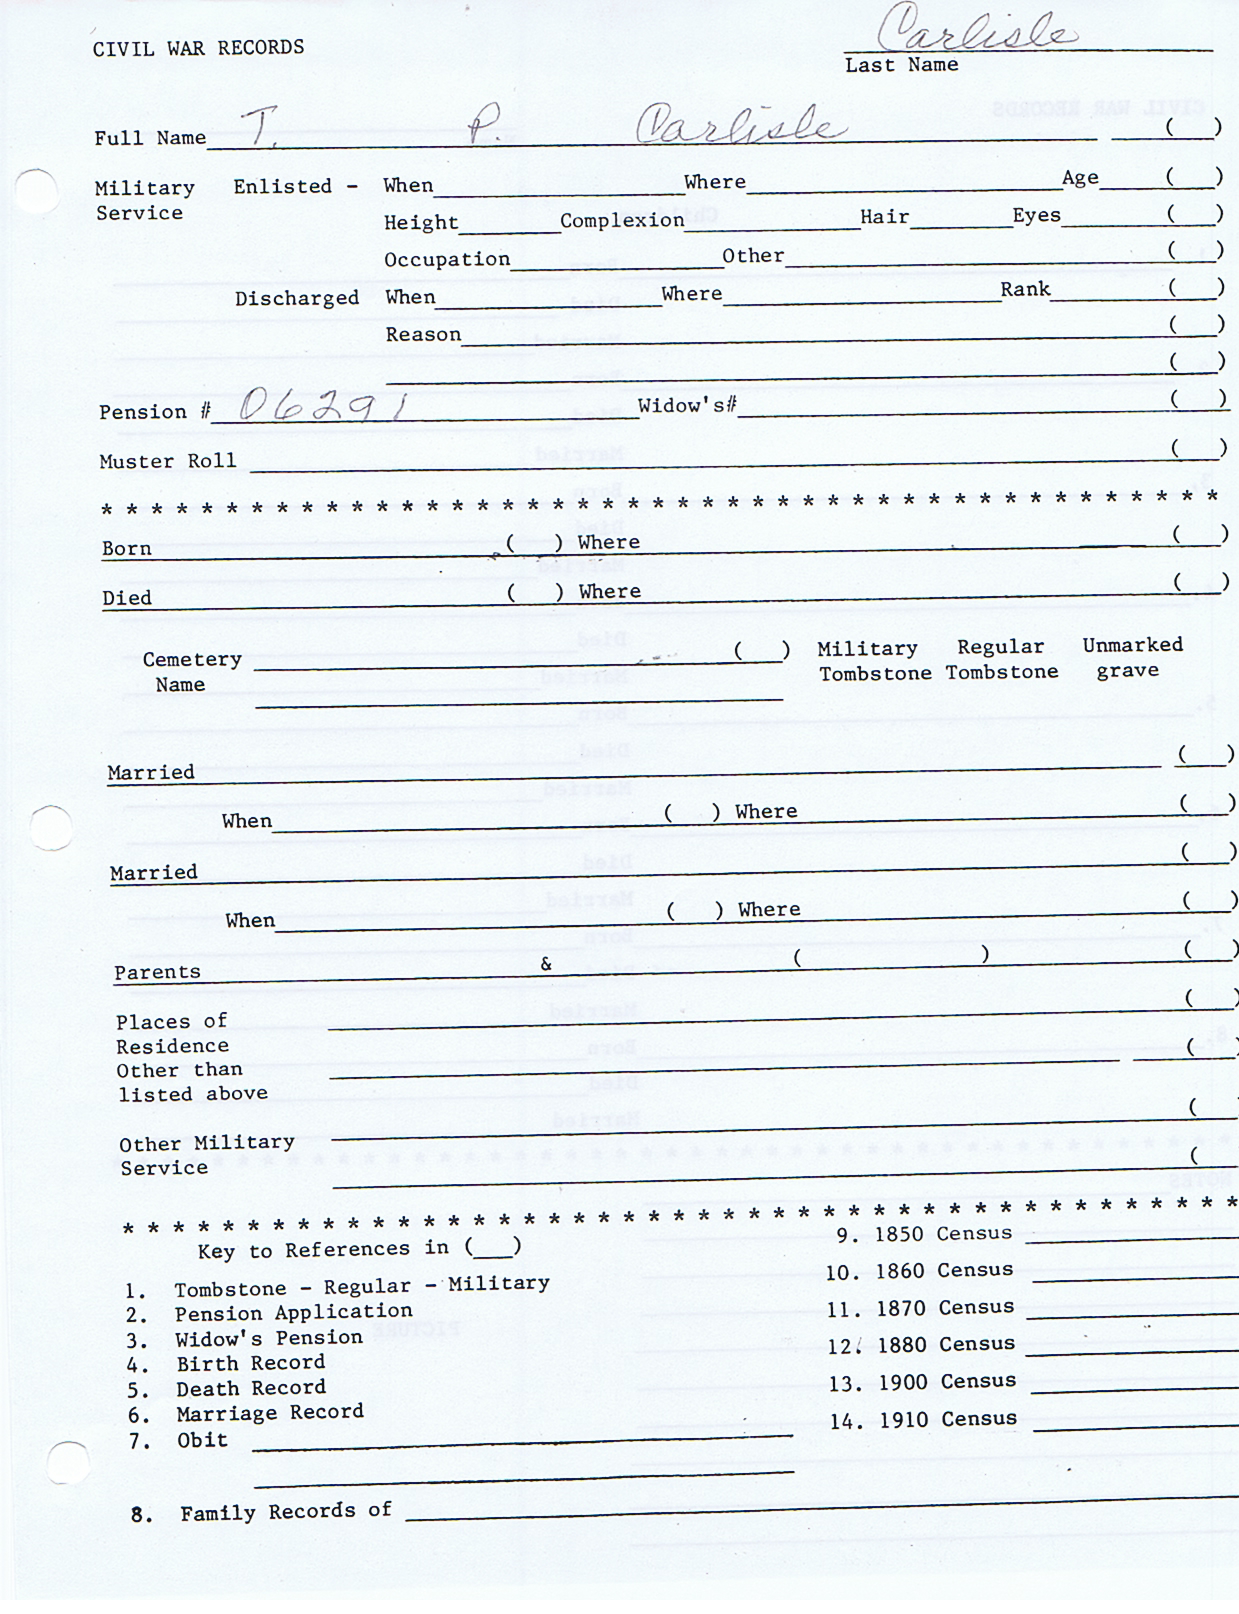 carlisle-kaufman_civil_war_records-3527